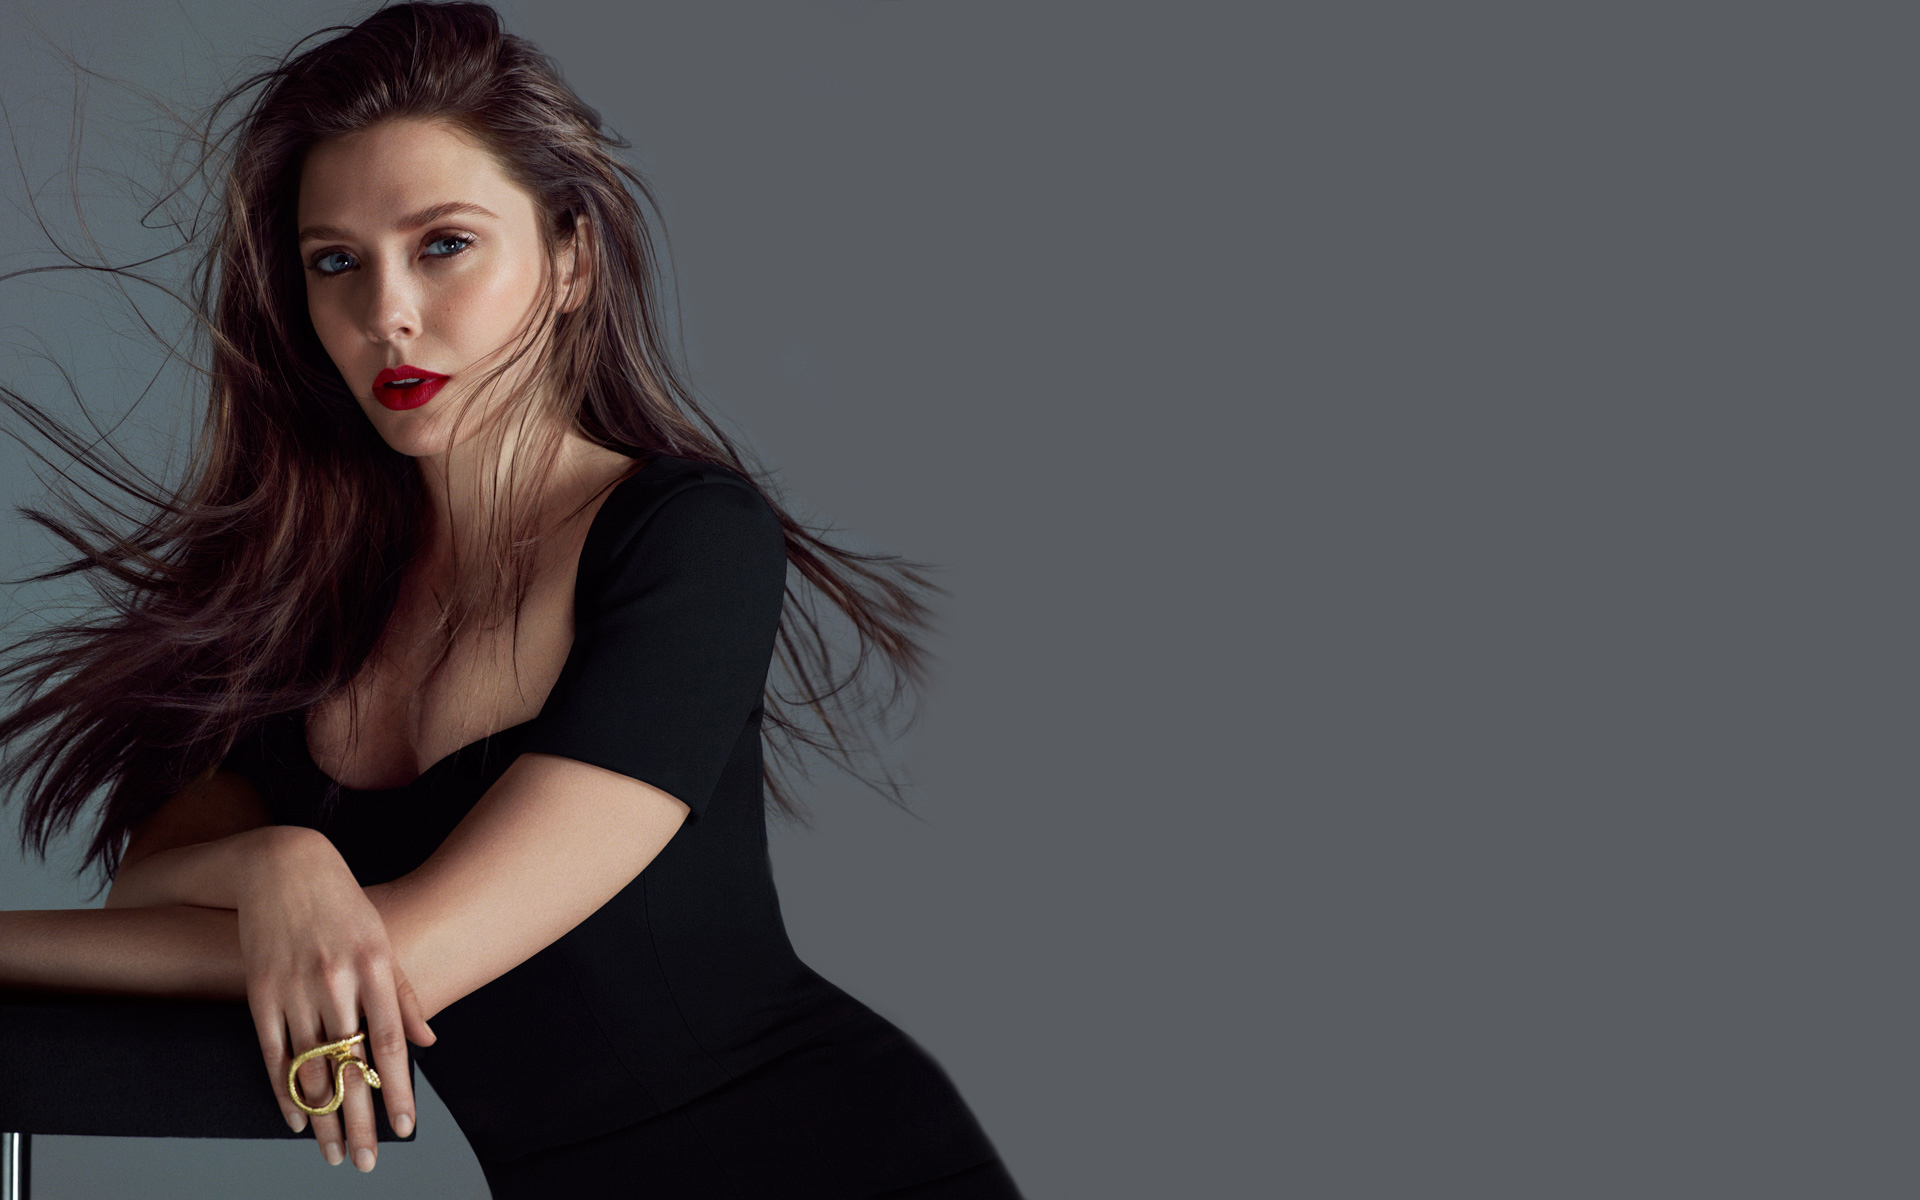 Elizabeth Olsen Full HD Wallpaper And Background Image